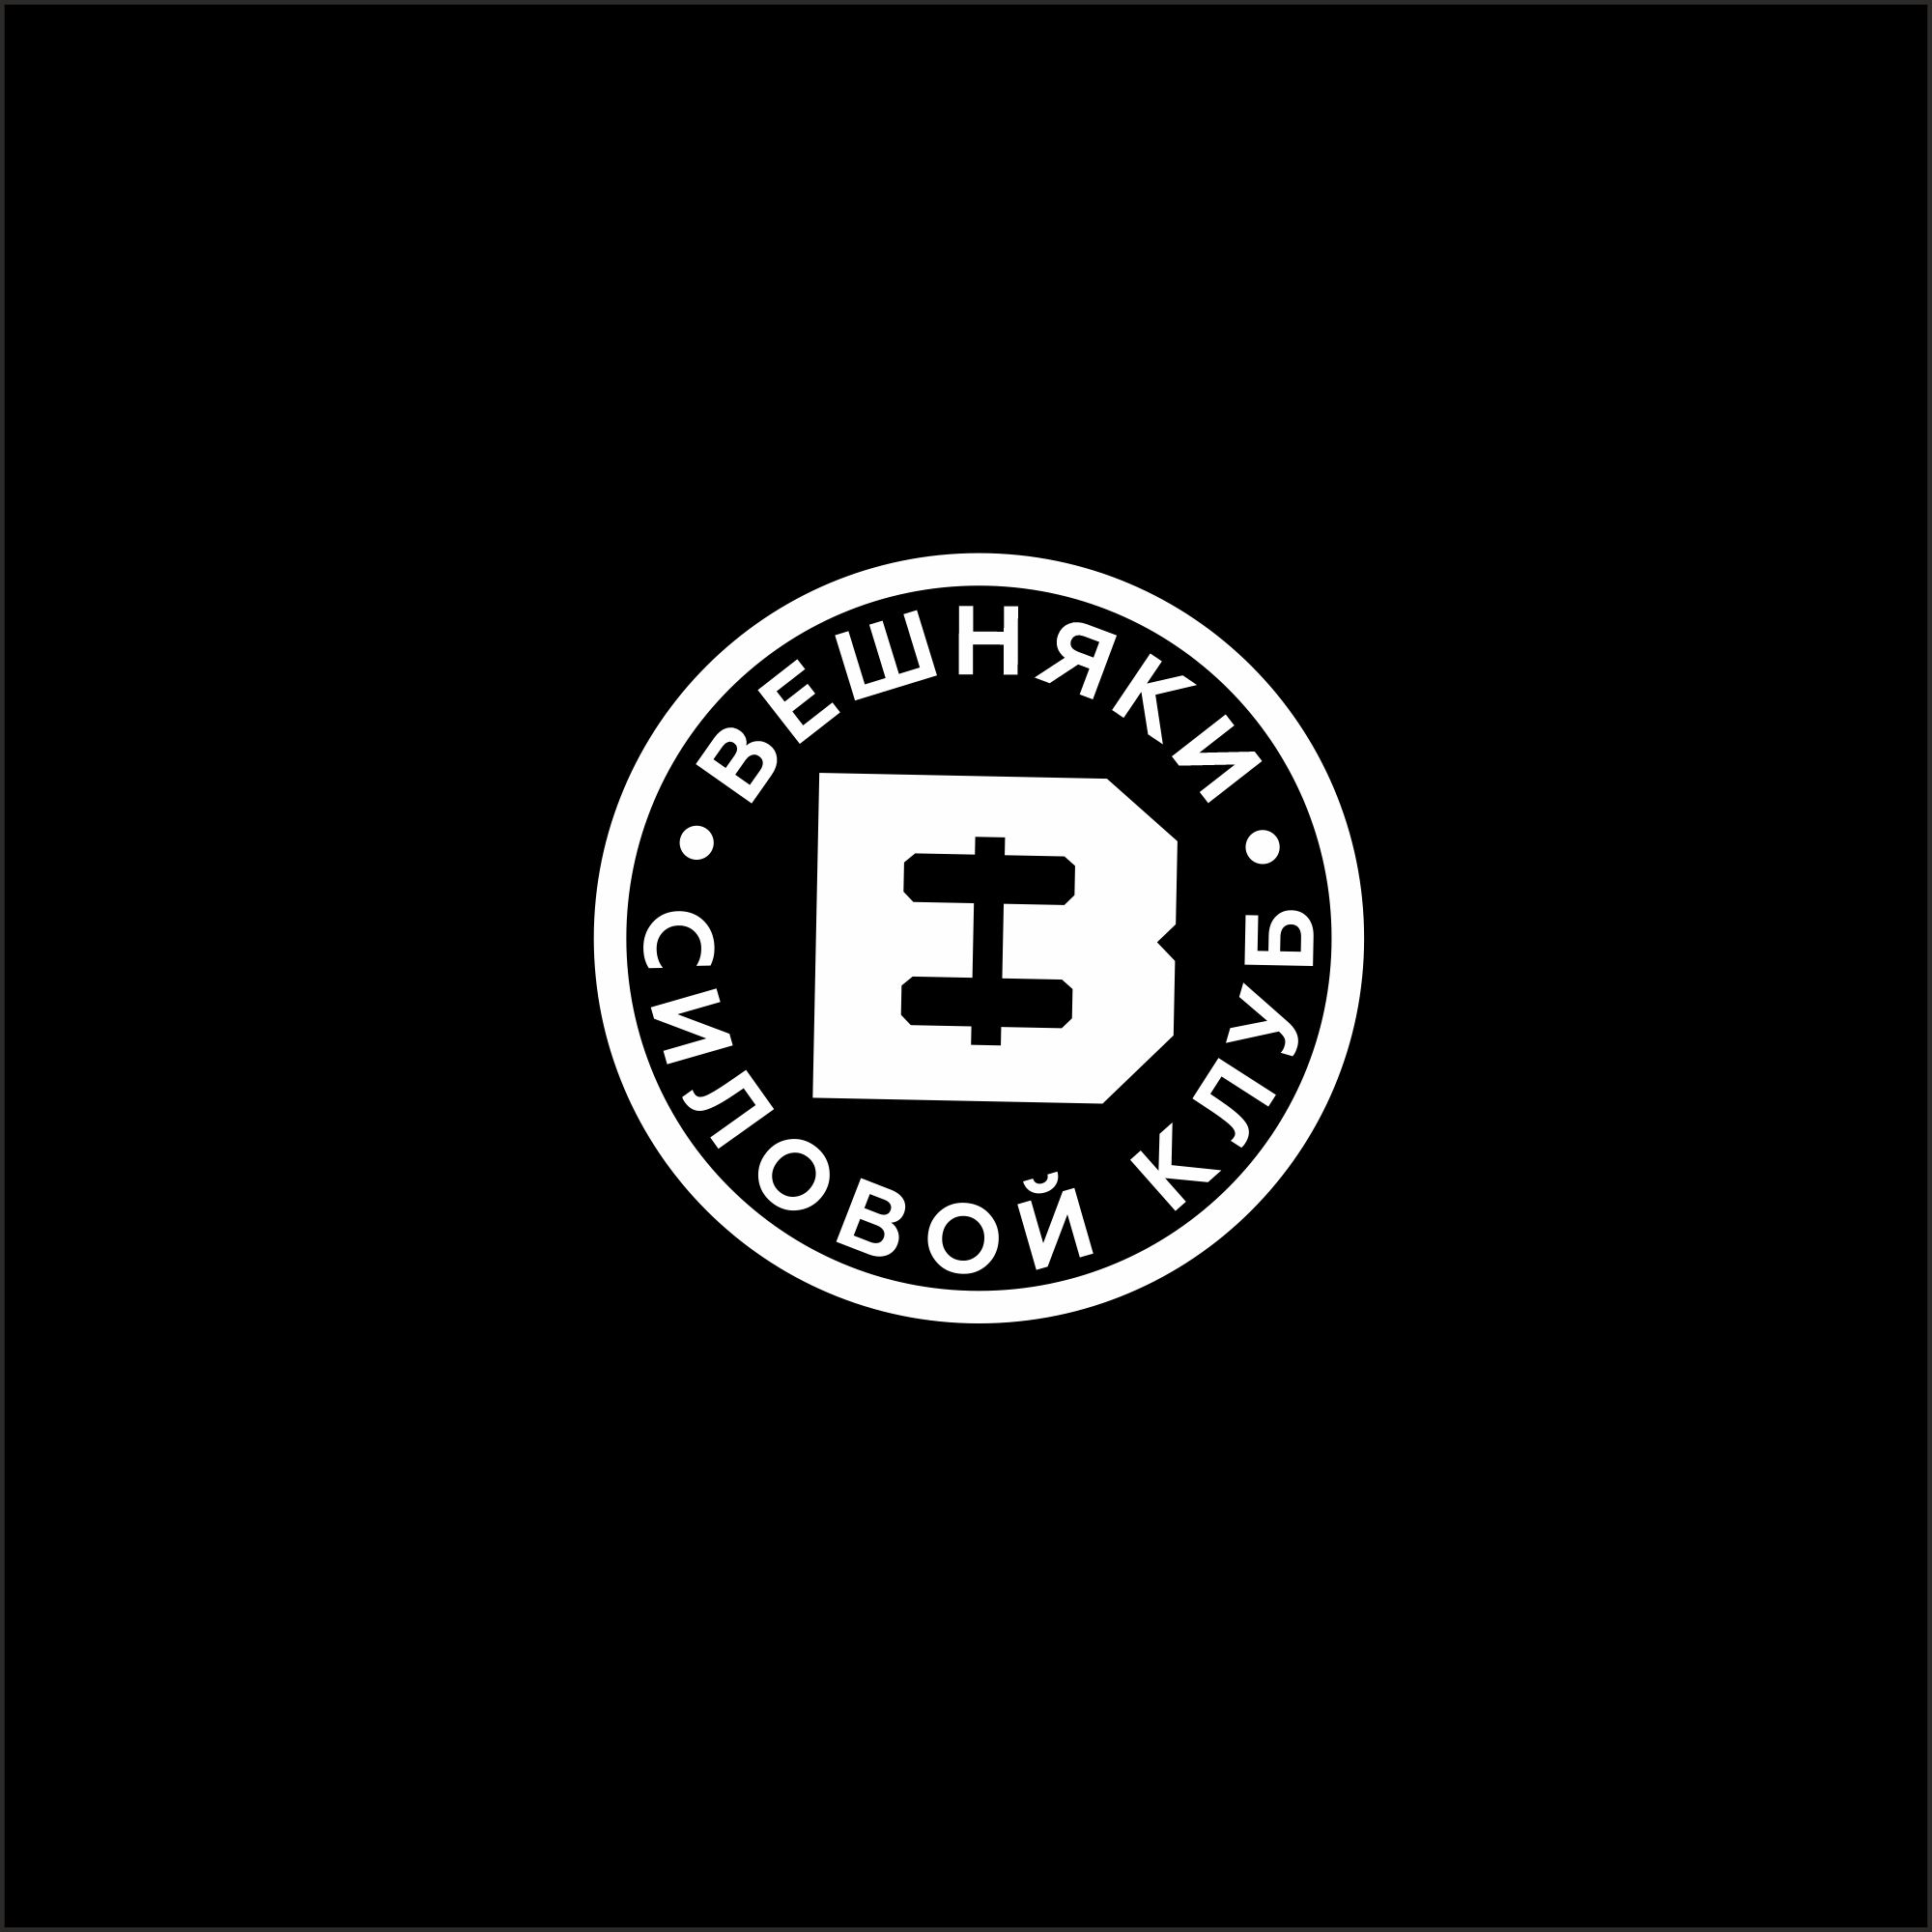 Адаптация (разработка) логотипа Силового клуба ВЕШНЯКИ в инт фото f_8475fbf3123ae557.jpg